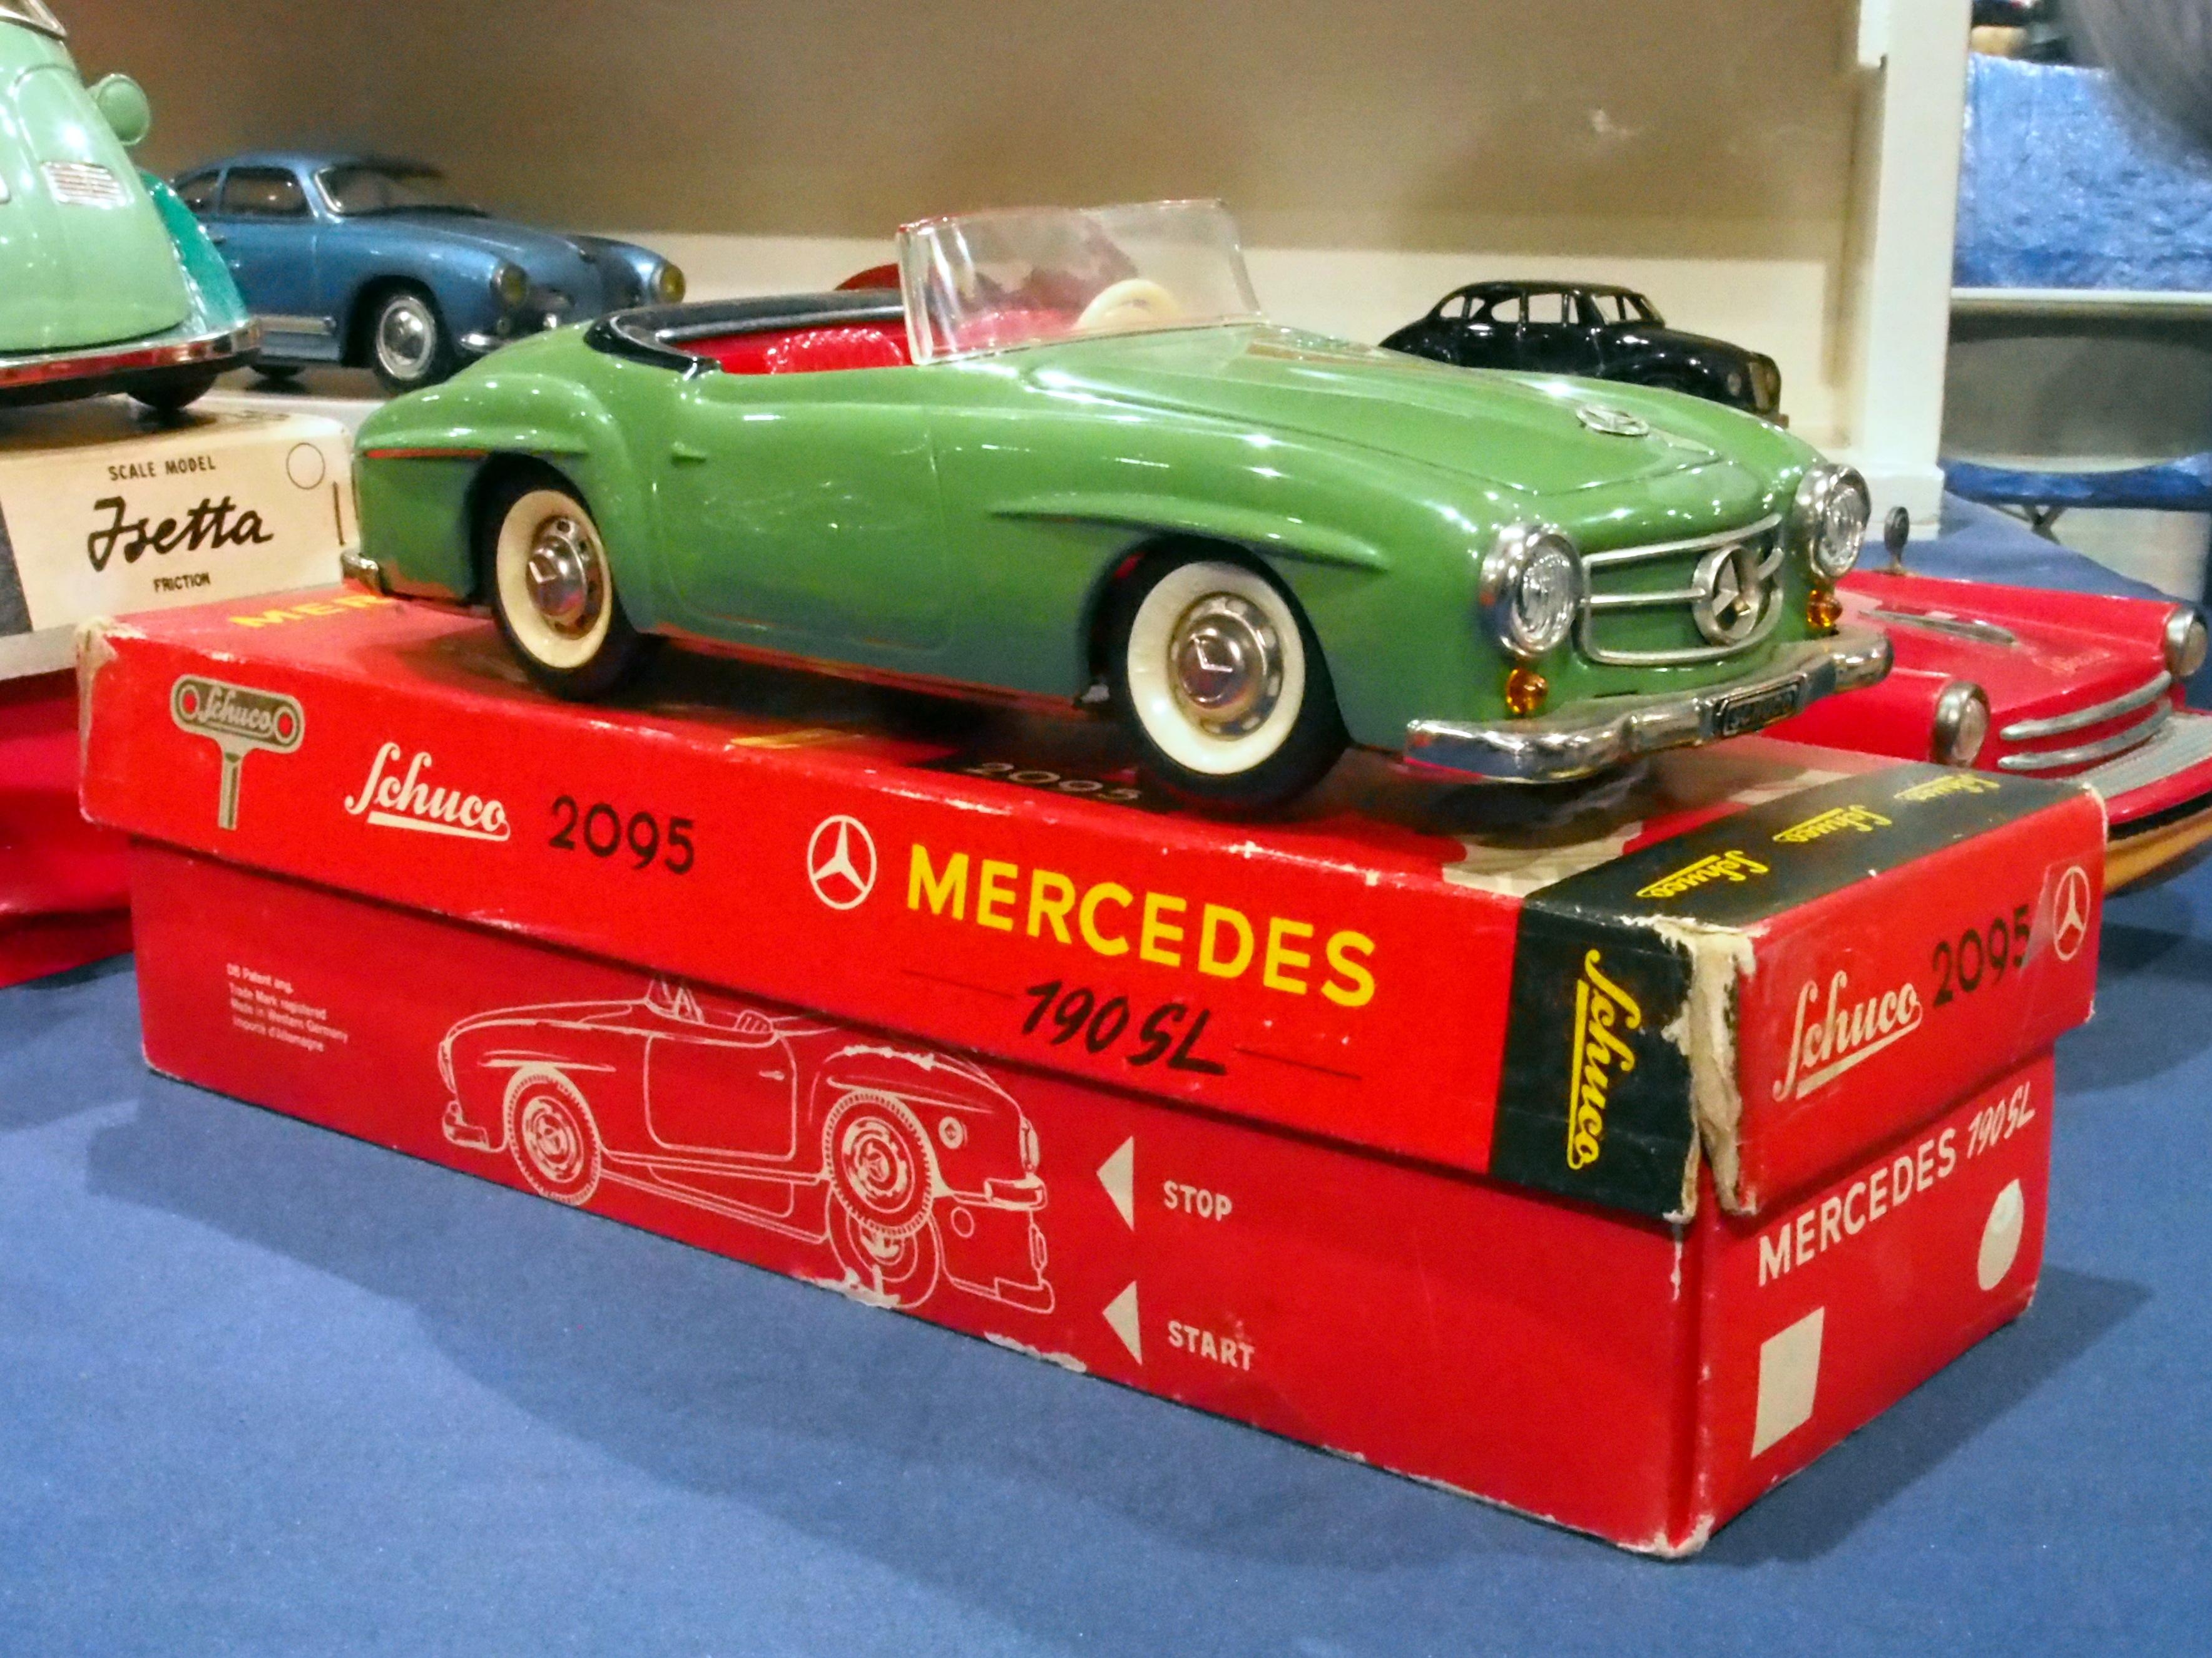 File:Litho tin toy green Mercedes 190SL, Schuco 2095 pic3.JPG